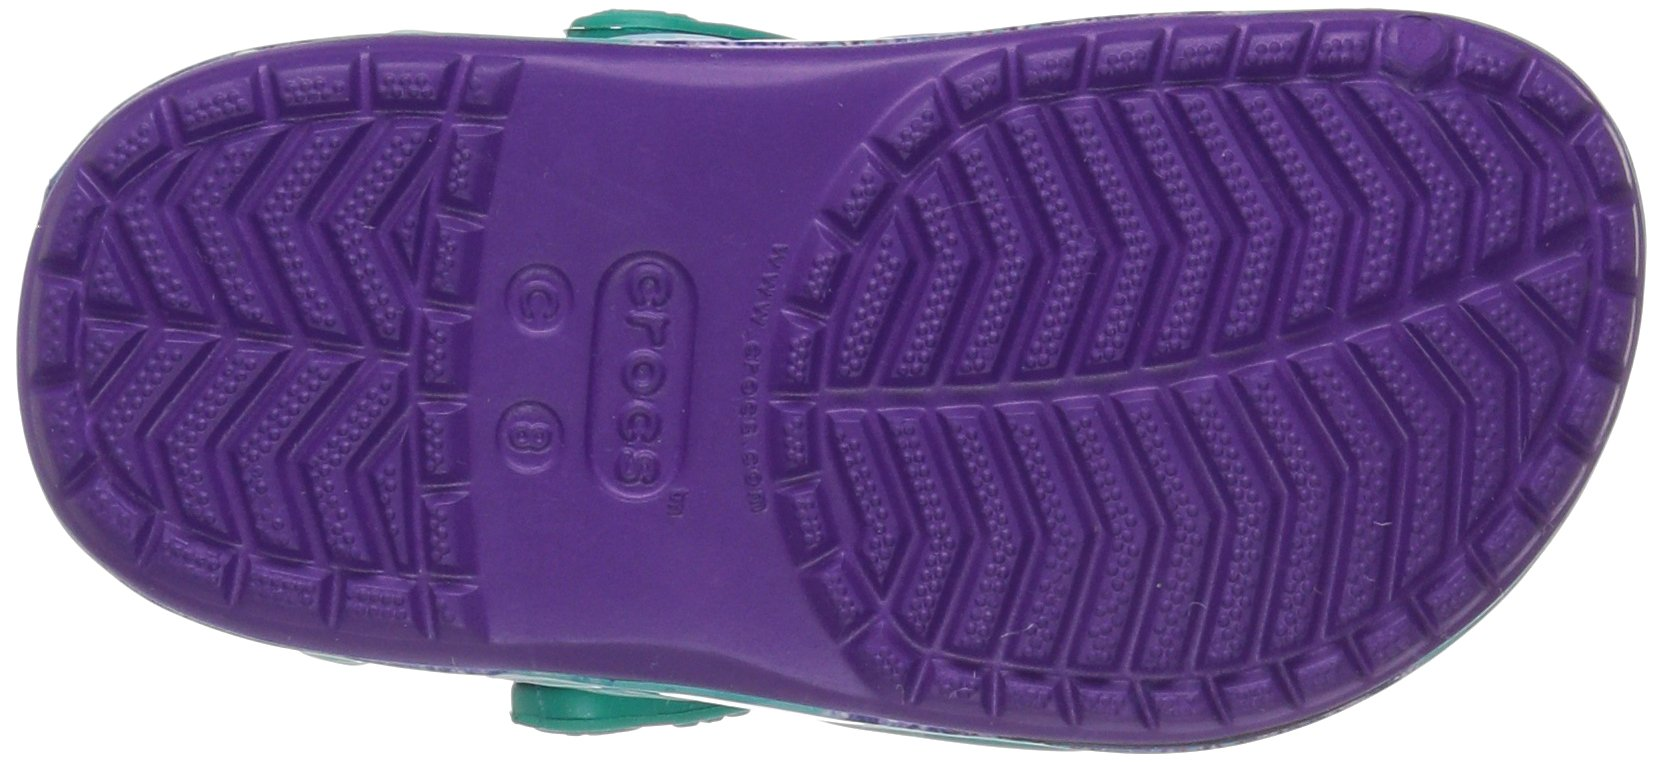 Crocs Girls' CB Princess Ariel K Clog, Amethyst, 13 M US Little Kid by Crocs (Image #3)